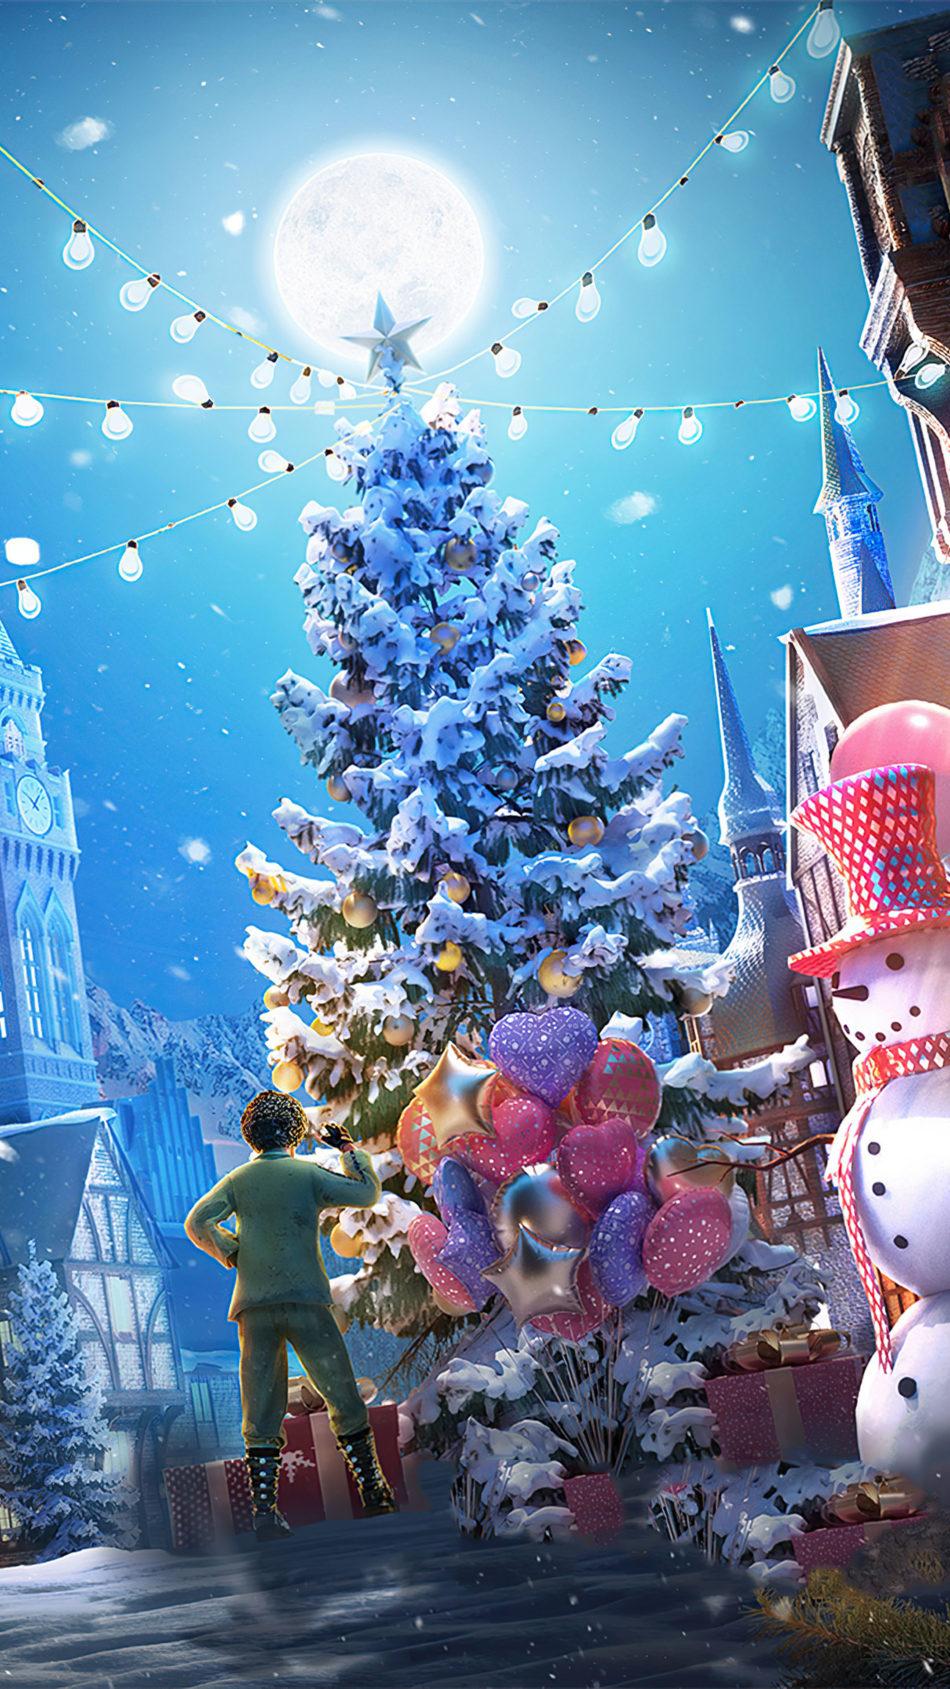 PUBG Mobile Christmas Tree 4K Ultra HD Mobile Wallpaper